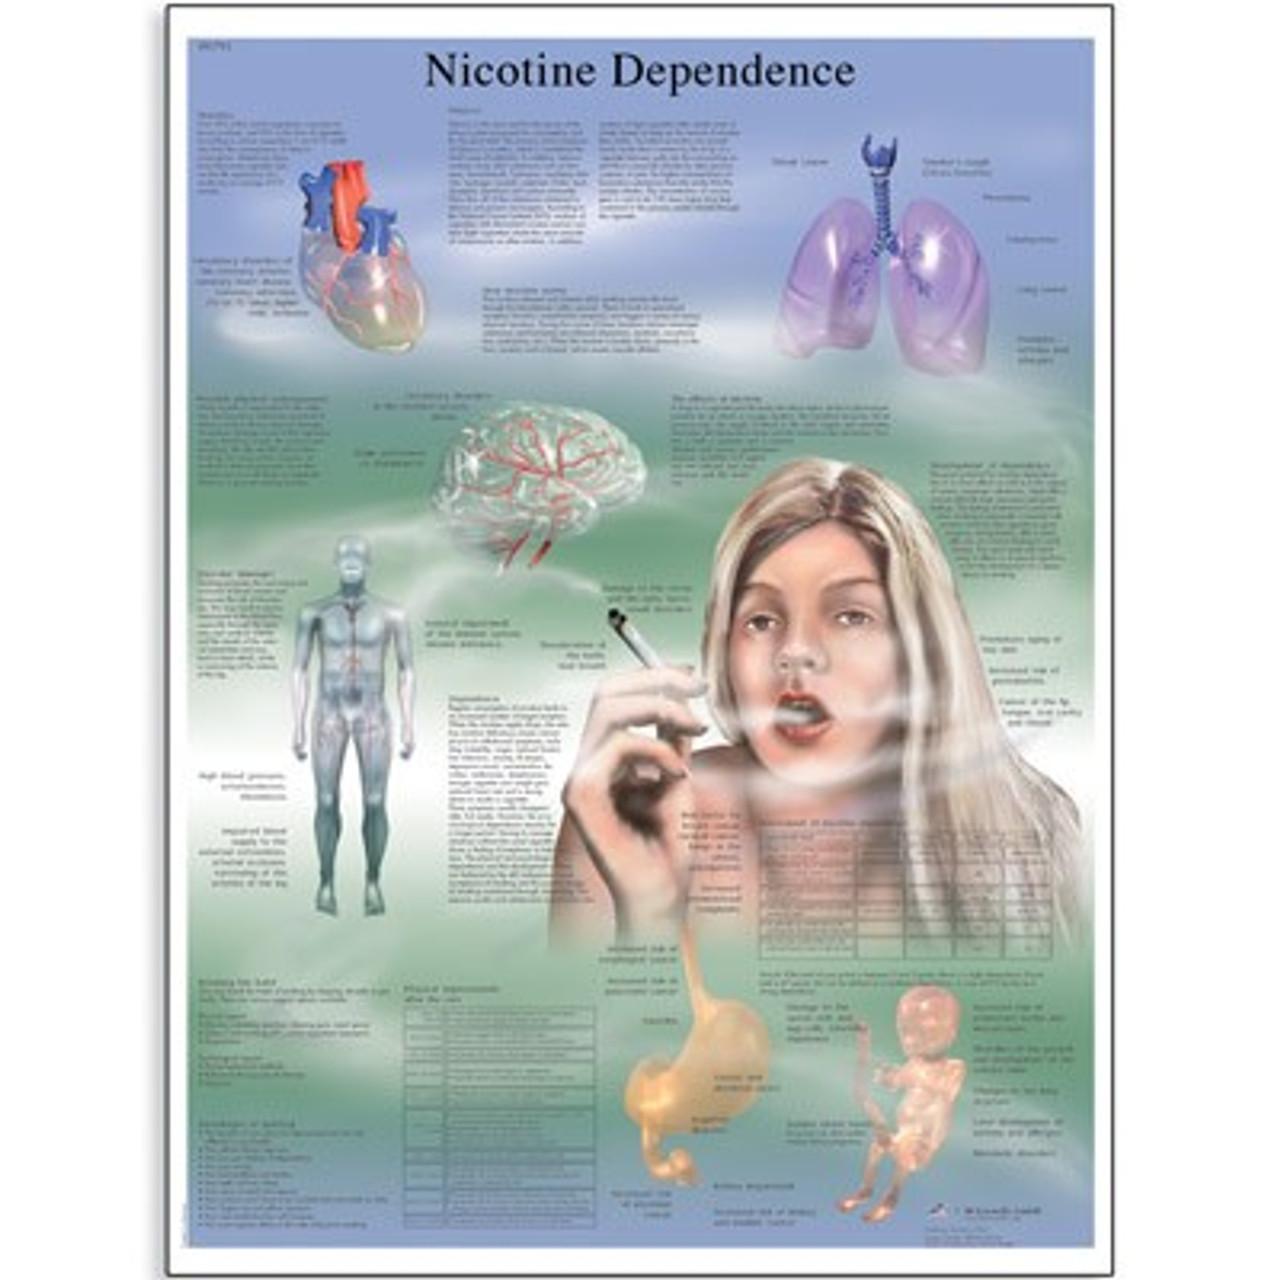 Nicotine Dependence Poster